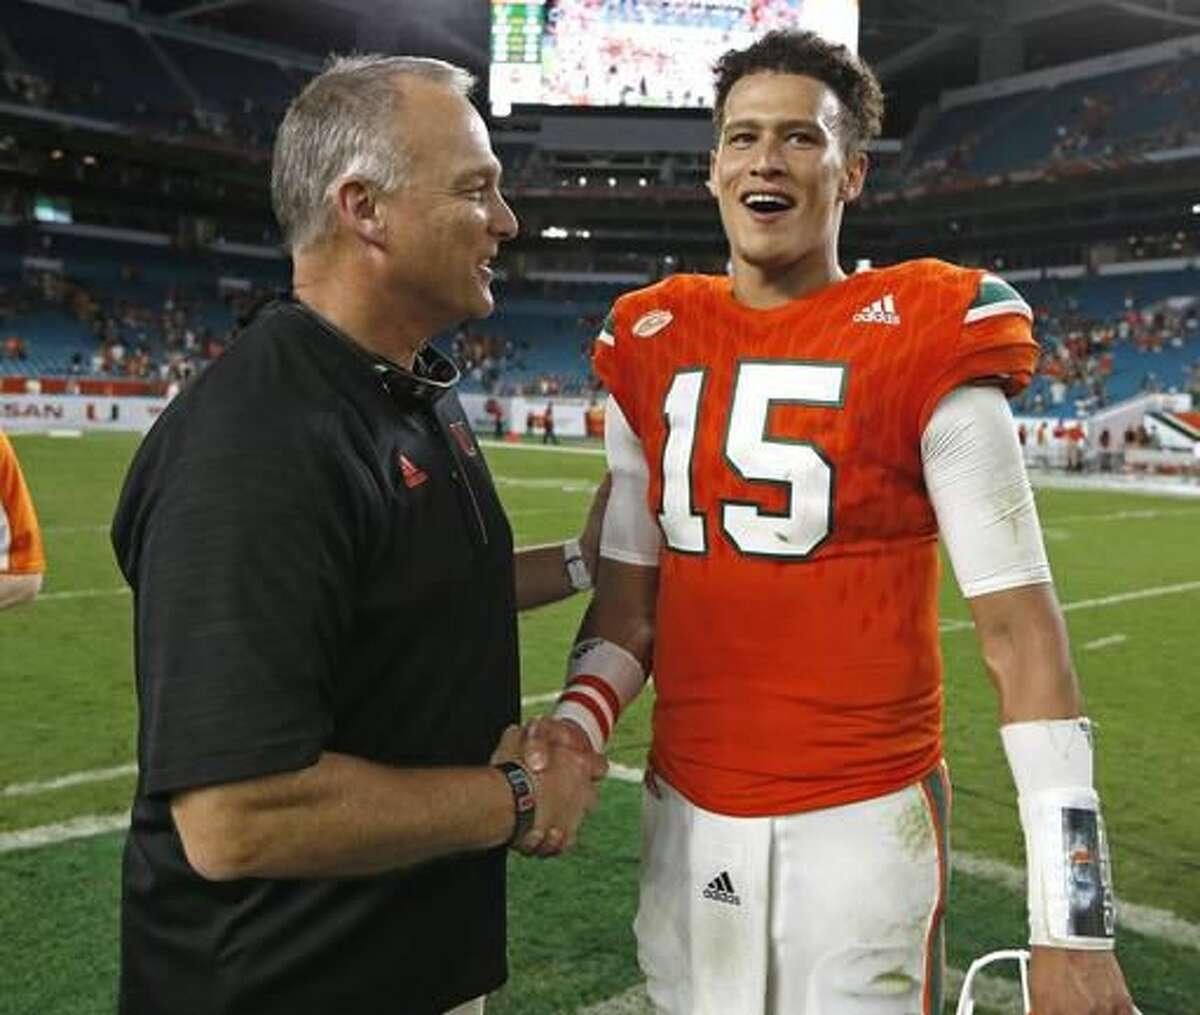 Miami head coach Mark Richt, left, shakes hands with quarterback Brad Kaaya (15) on the field after an NCAA college football game against Duke in Miami Gardens, Fla., Saturday, Nov. 26, 2016. (Al Diaz/Miami Herald via AP)